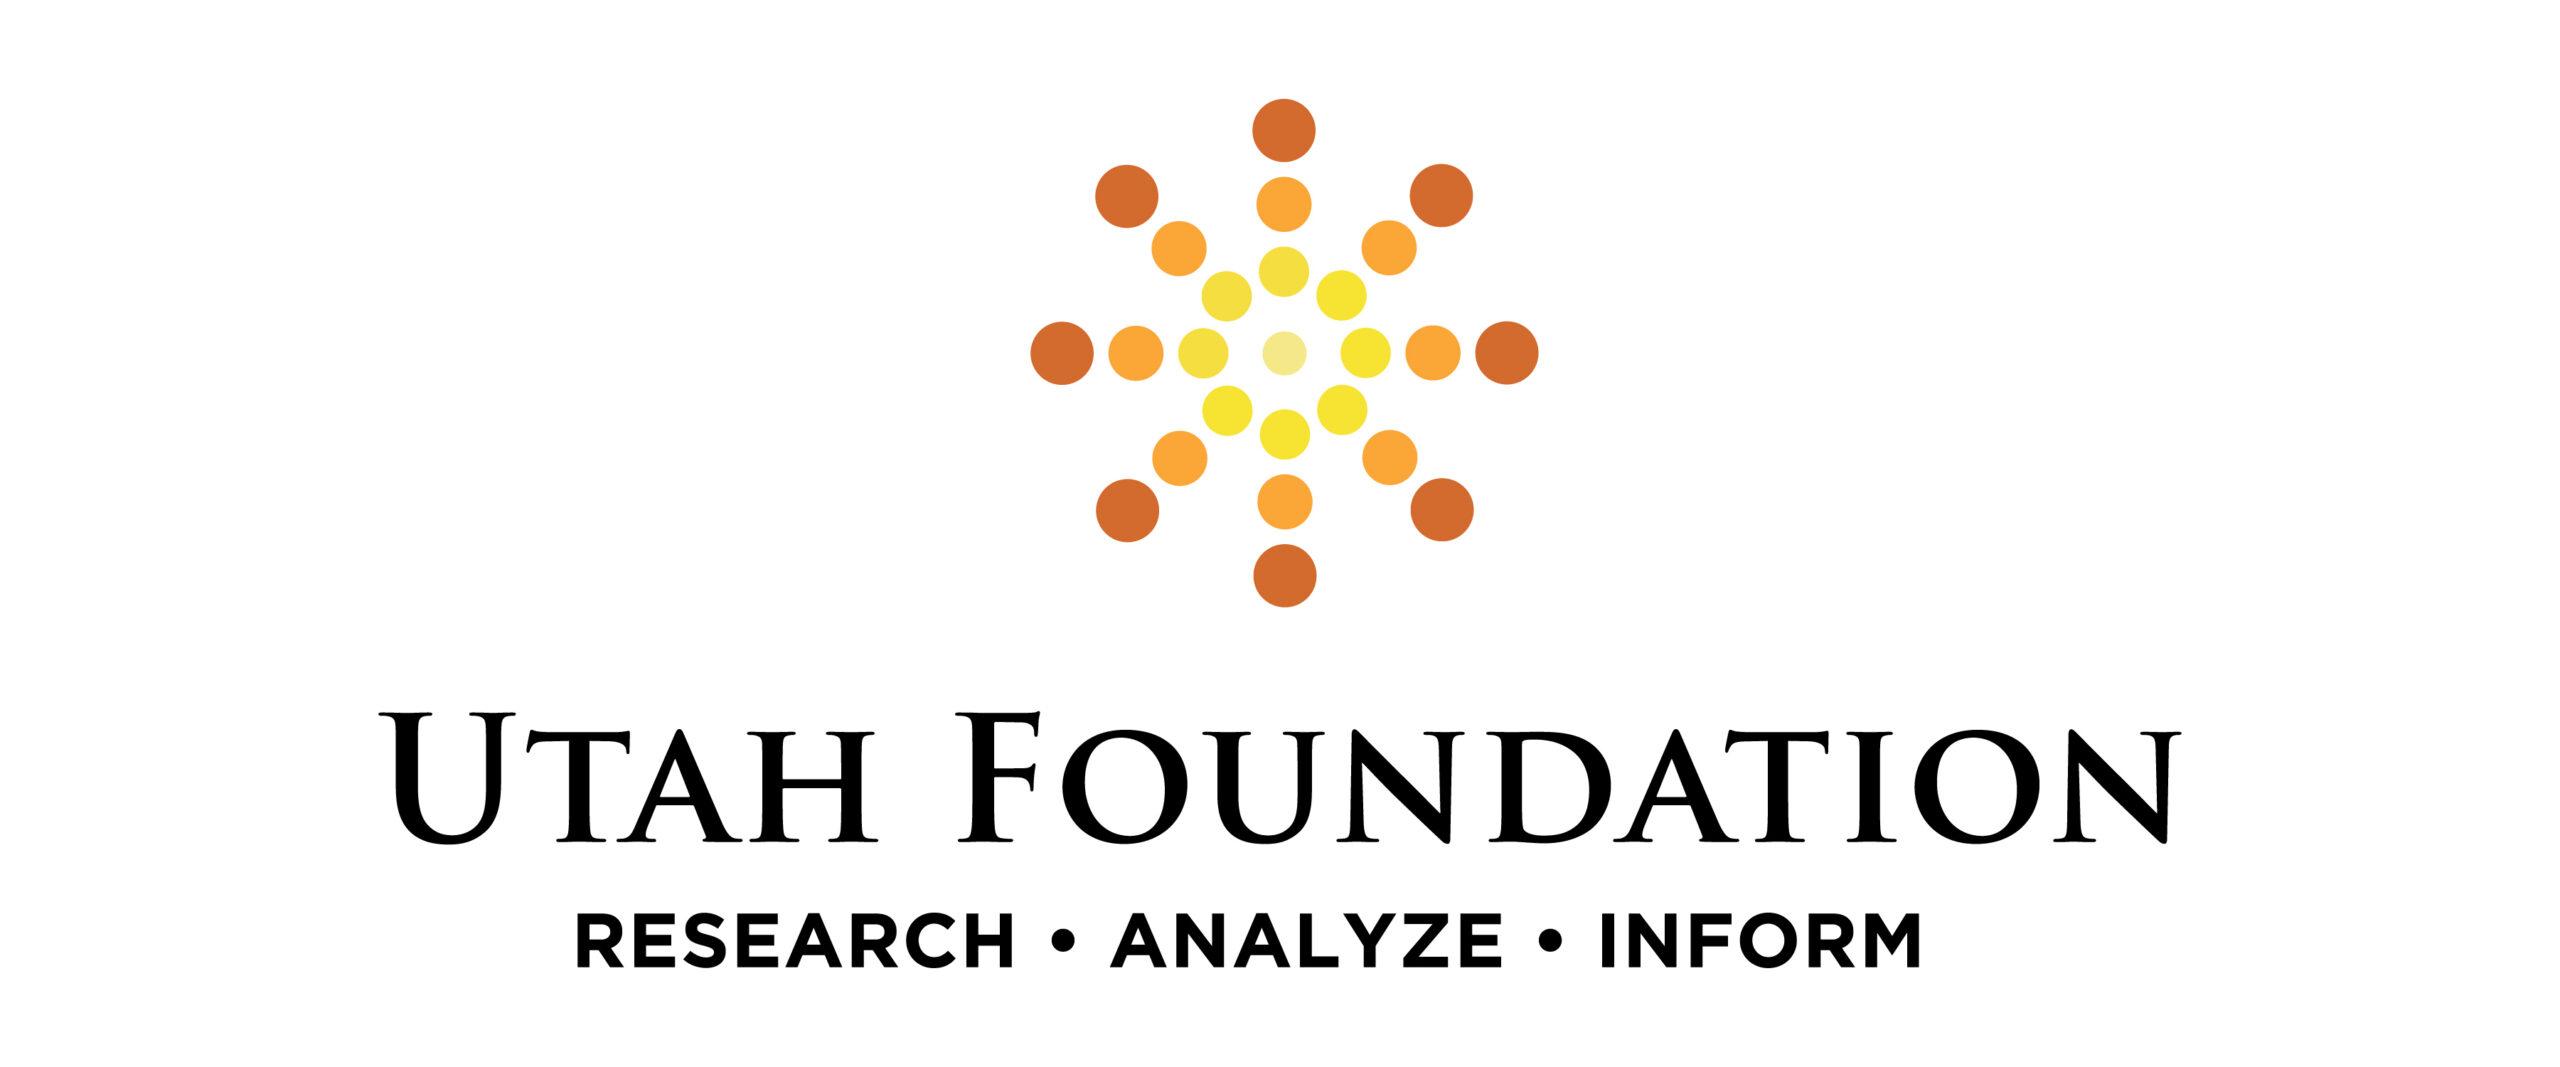 New Utah Foundation Logo